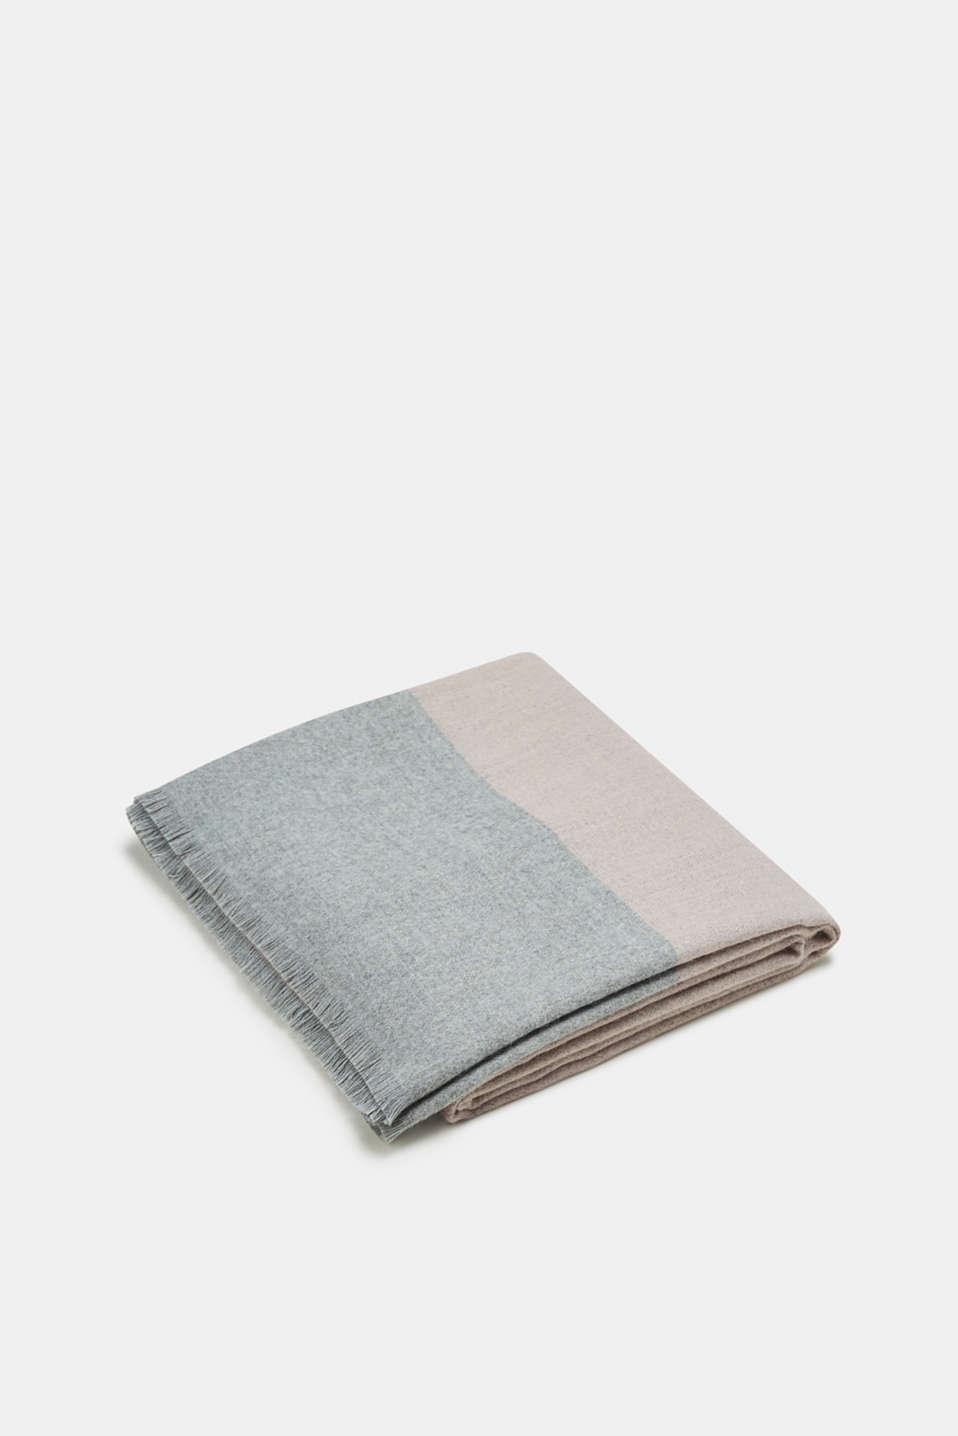 Elegant throw with contrasting stripes, made of Cashmink®, ROSE/GREY, detail image number 0